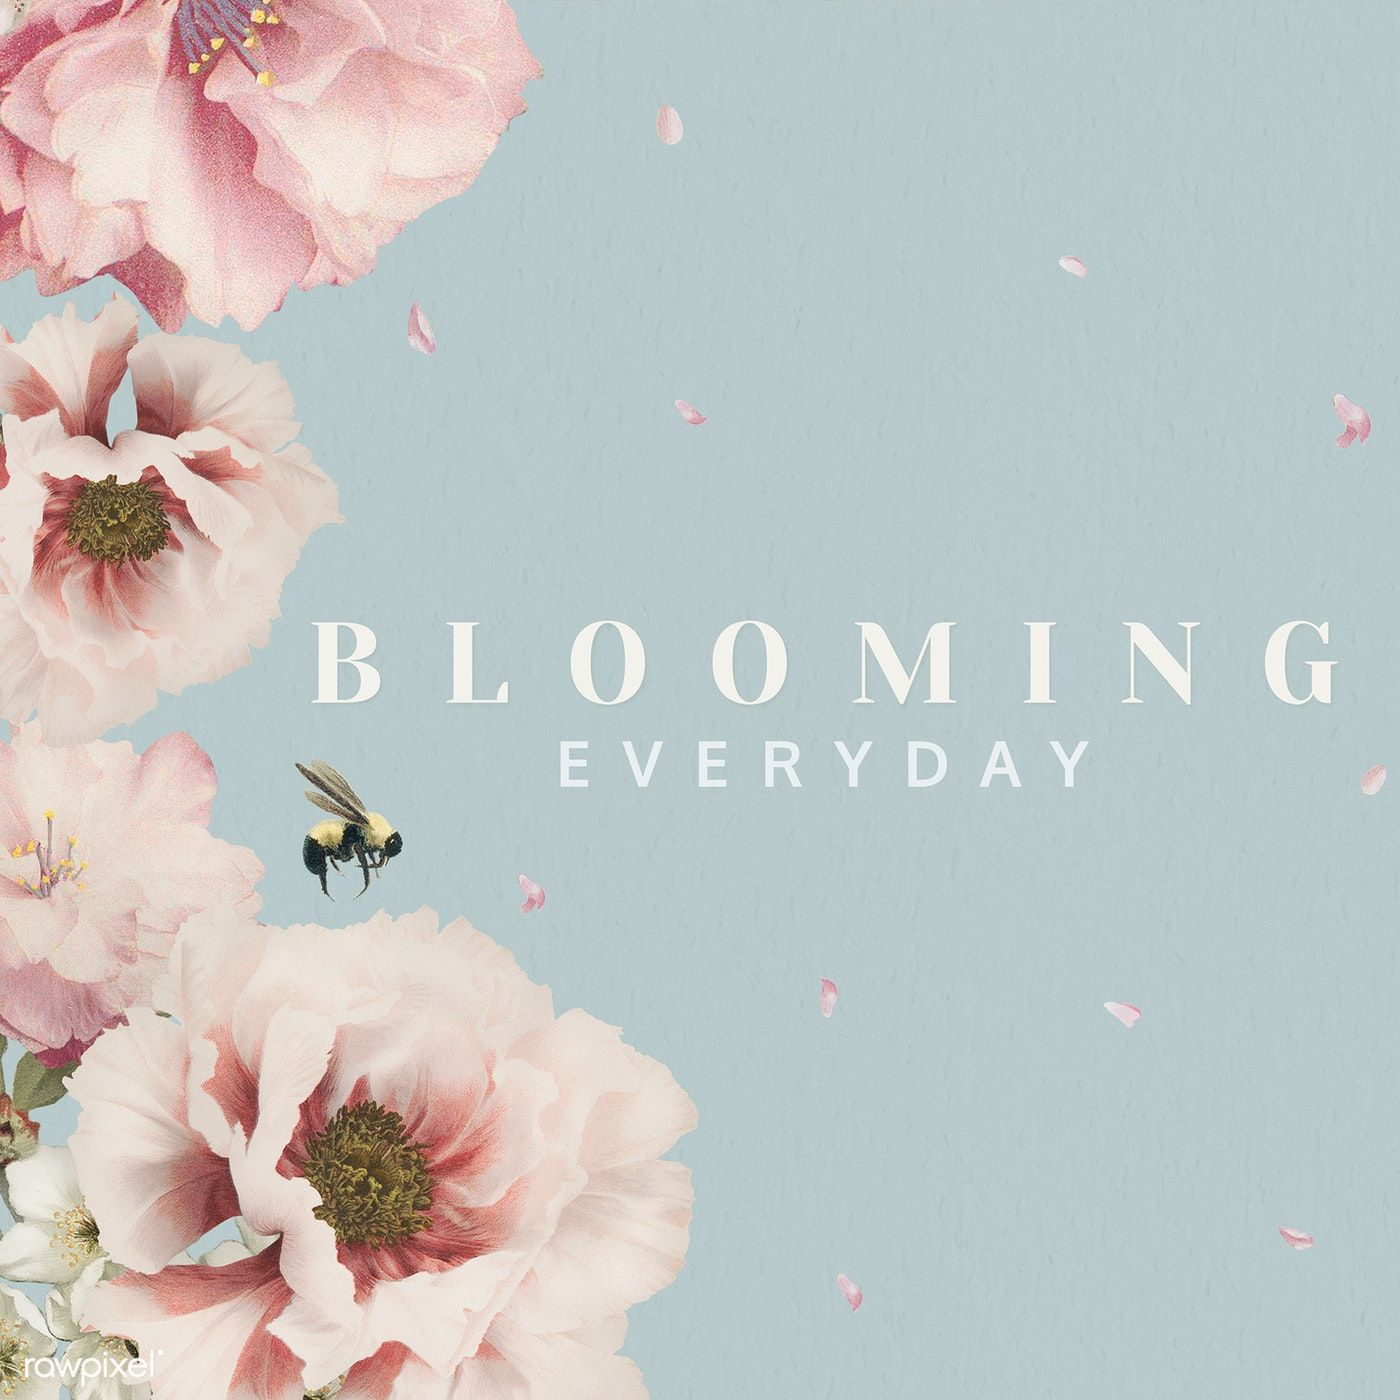 Download Premium Illustration Of Blooming Everyday Card Design Card Design Everyday Card Flower Illustration